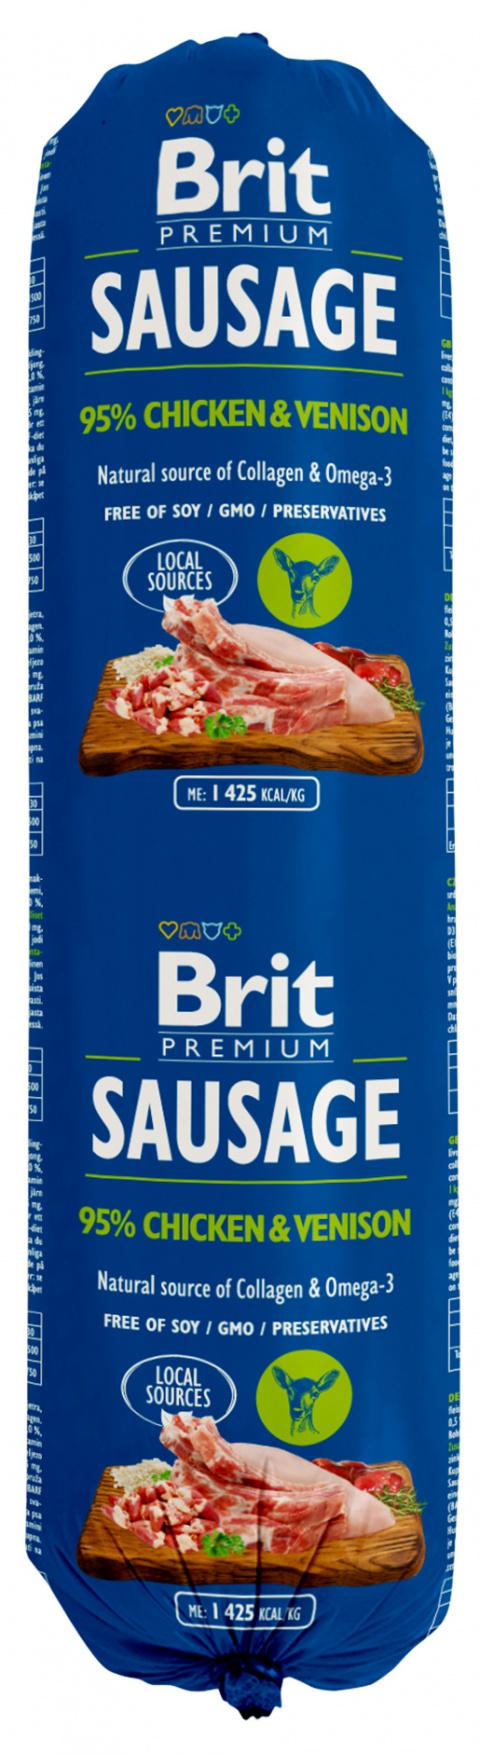 Salám Brit Sausage Chicken & Venison 800g title=